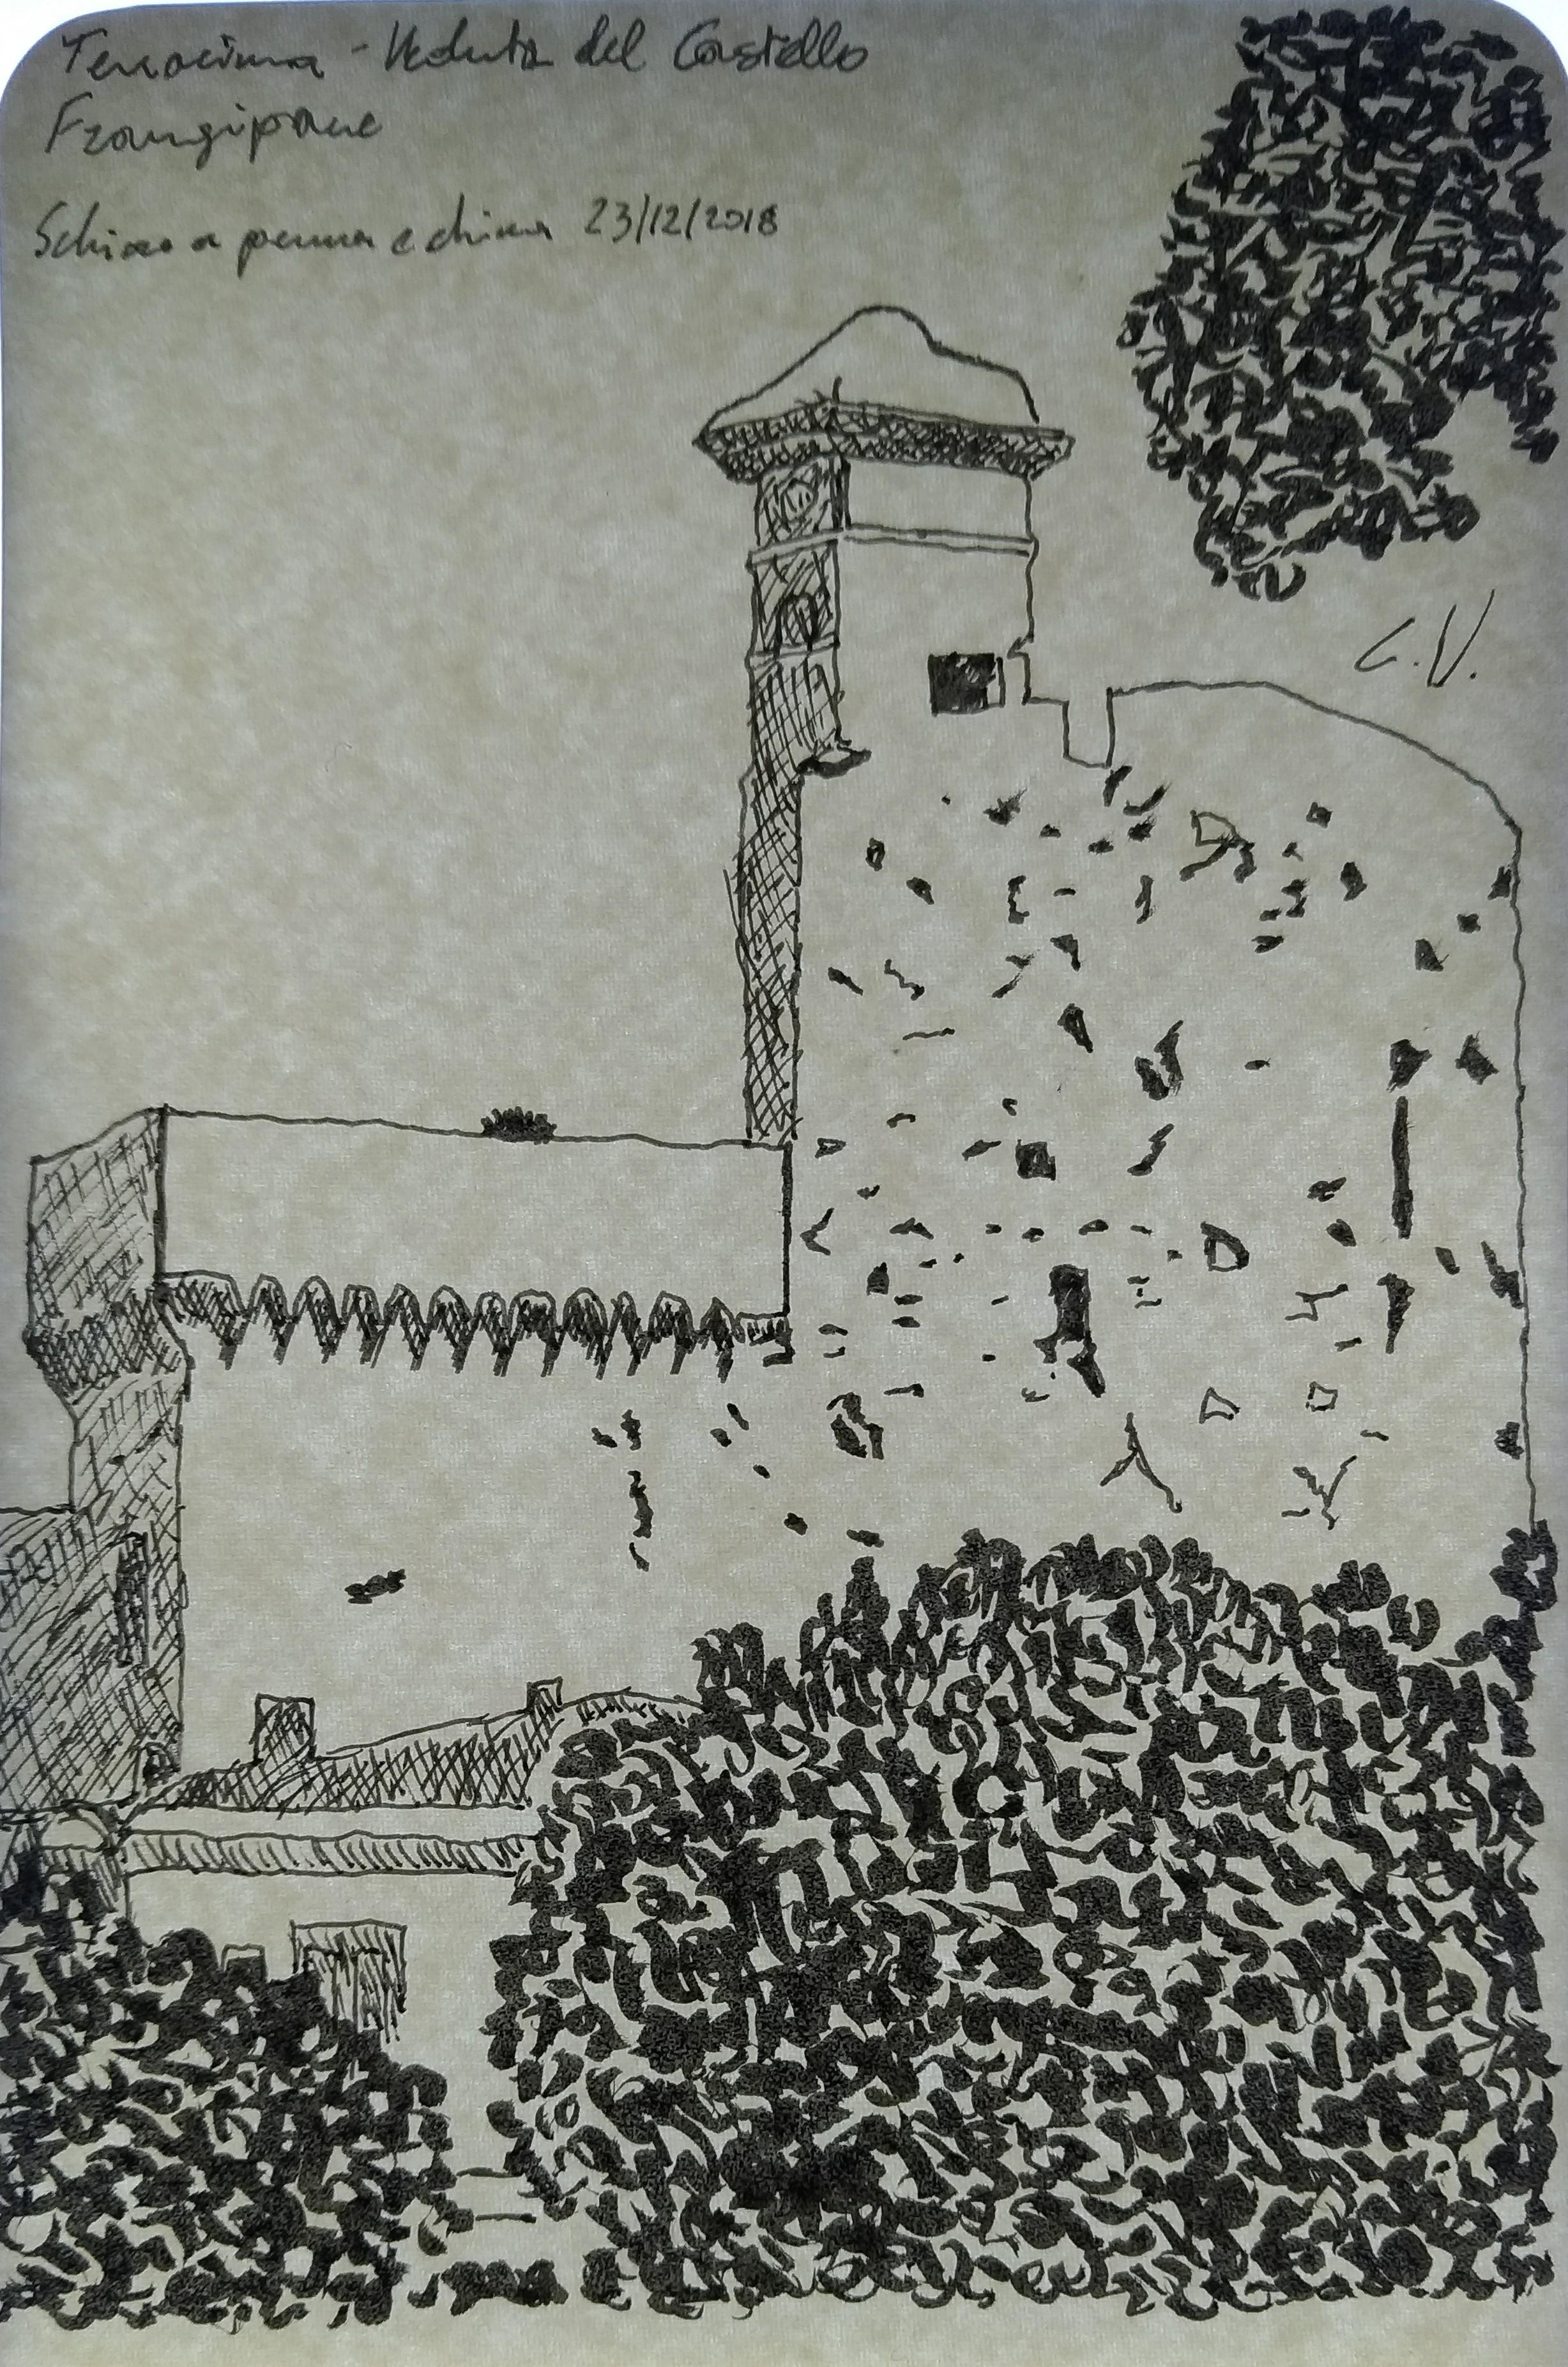 The Frangipane Castle in Terracina (Italy)